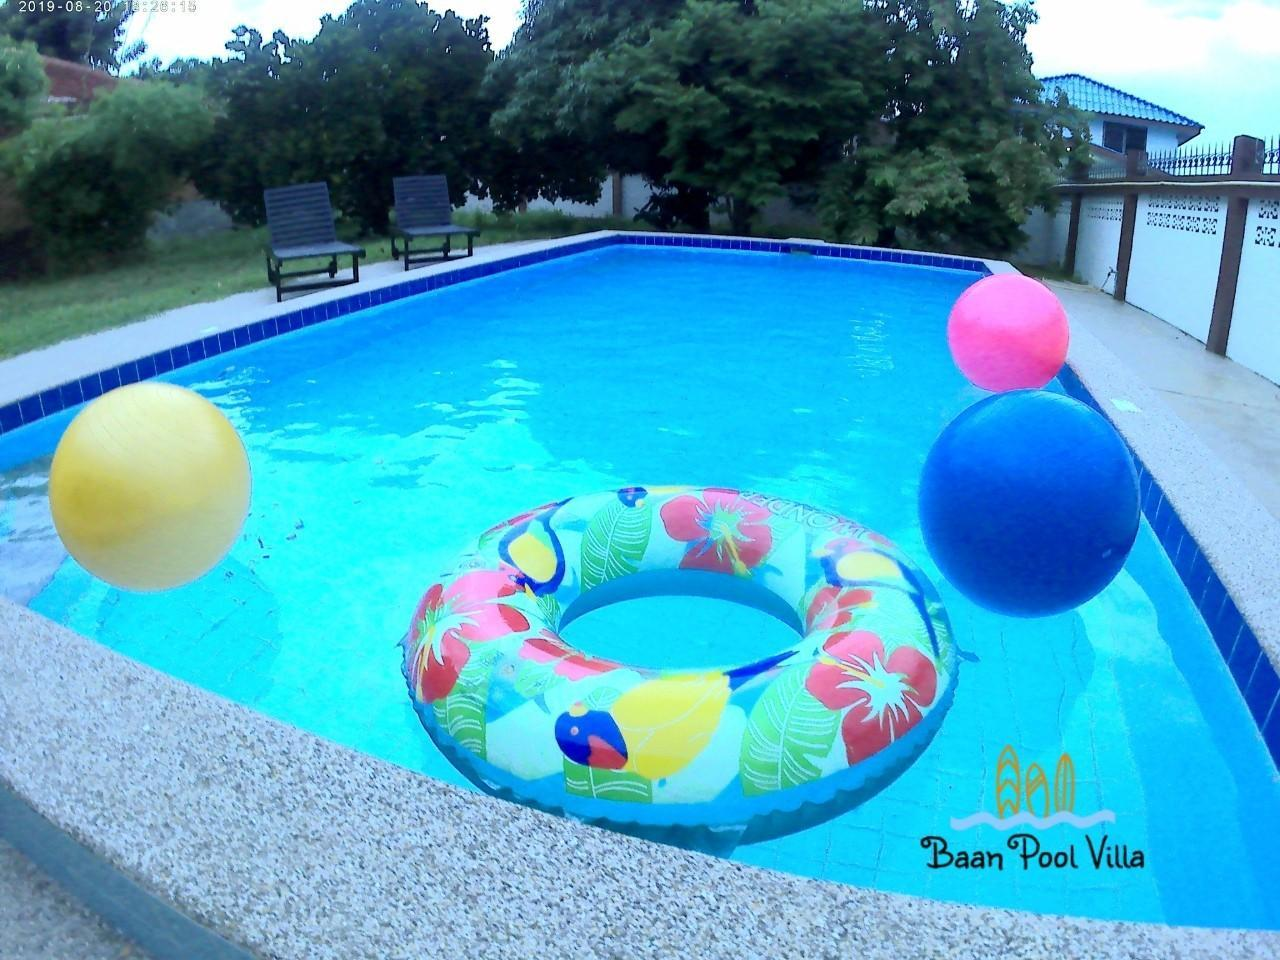 Baan Pool Villa02  Pattaya Nongkabok